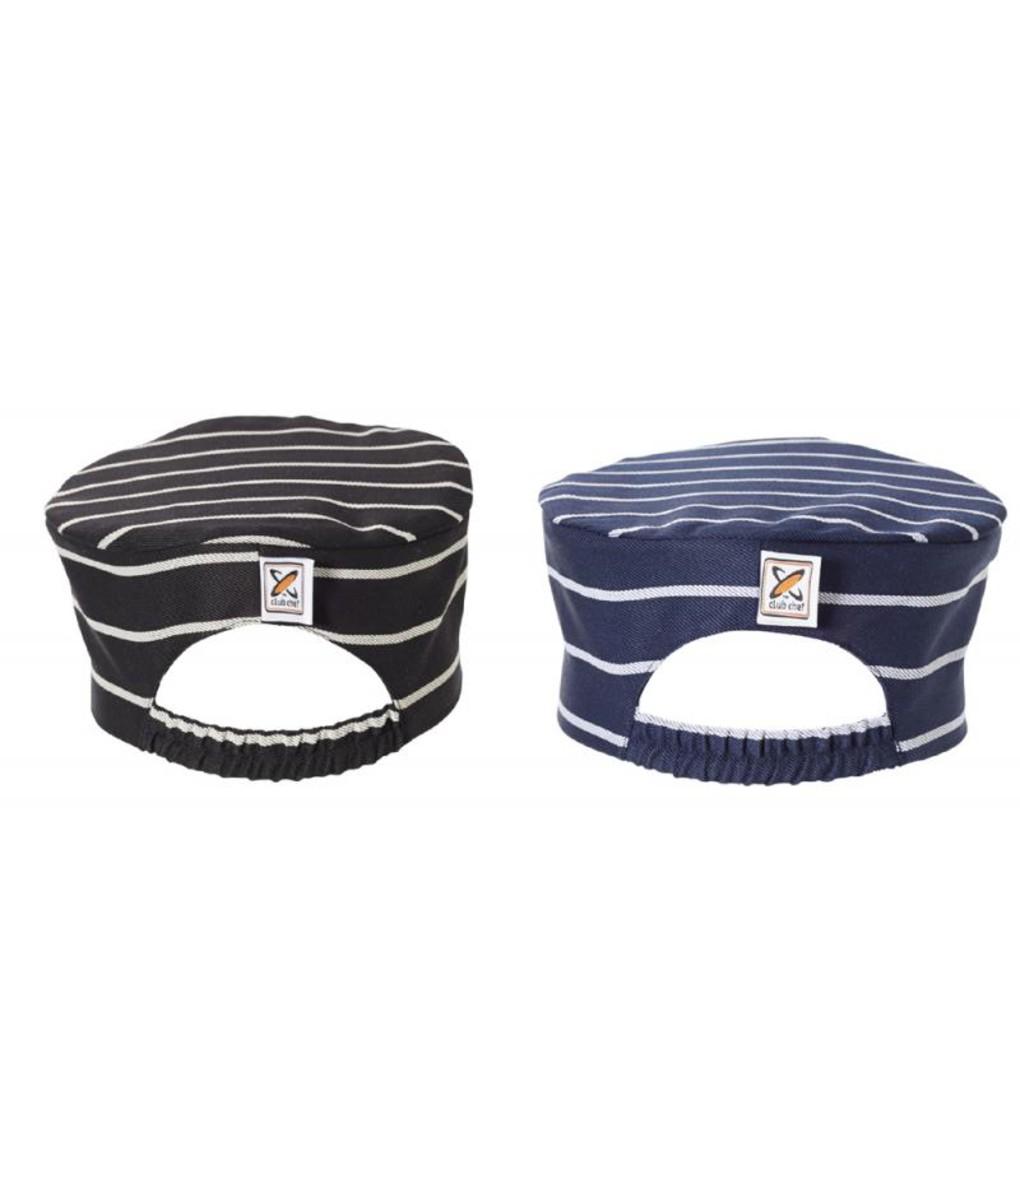 Flat Top Hat Pinstripe by Club Chef